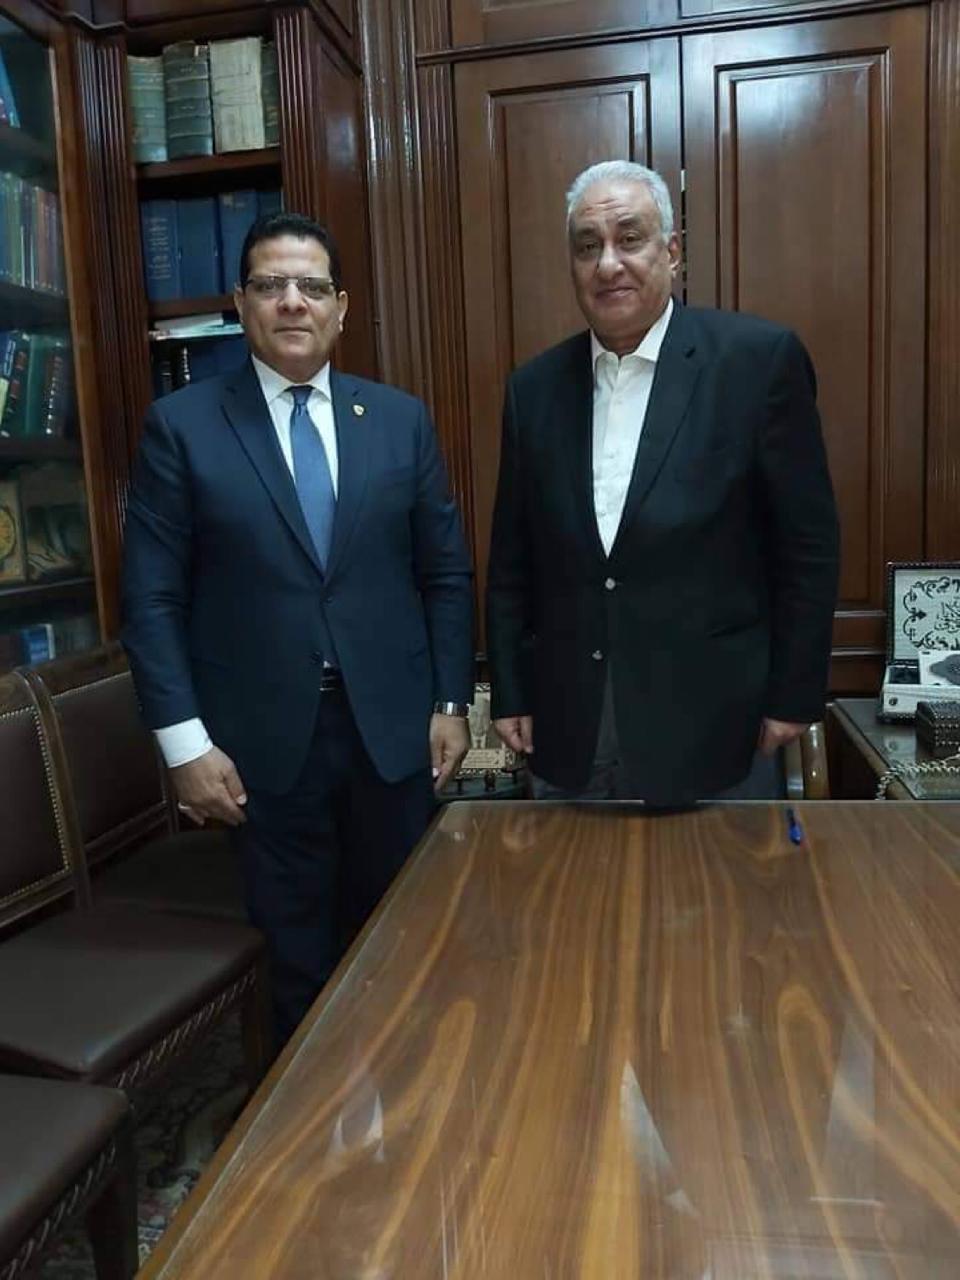 سامح عاشور رئيساً لمجلس حكماء ( ائتلاف مصر تدعم ابناءها )